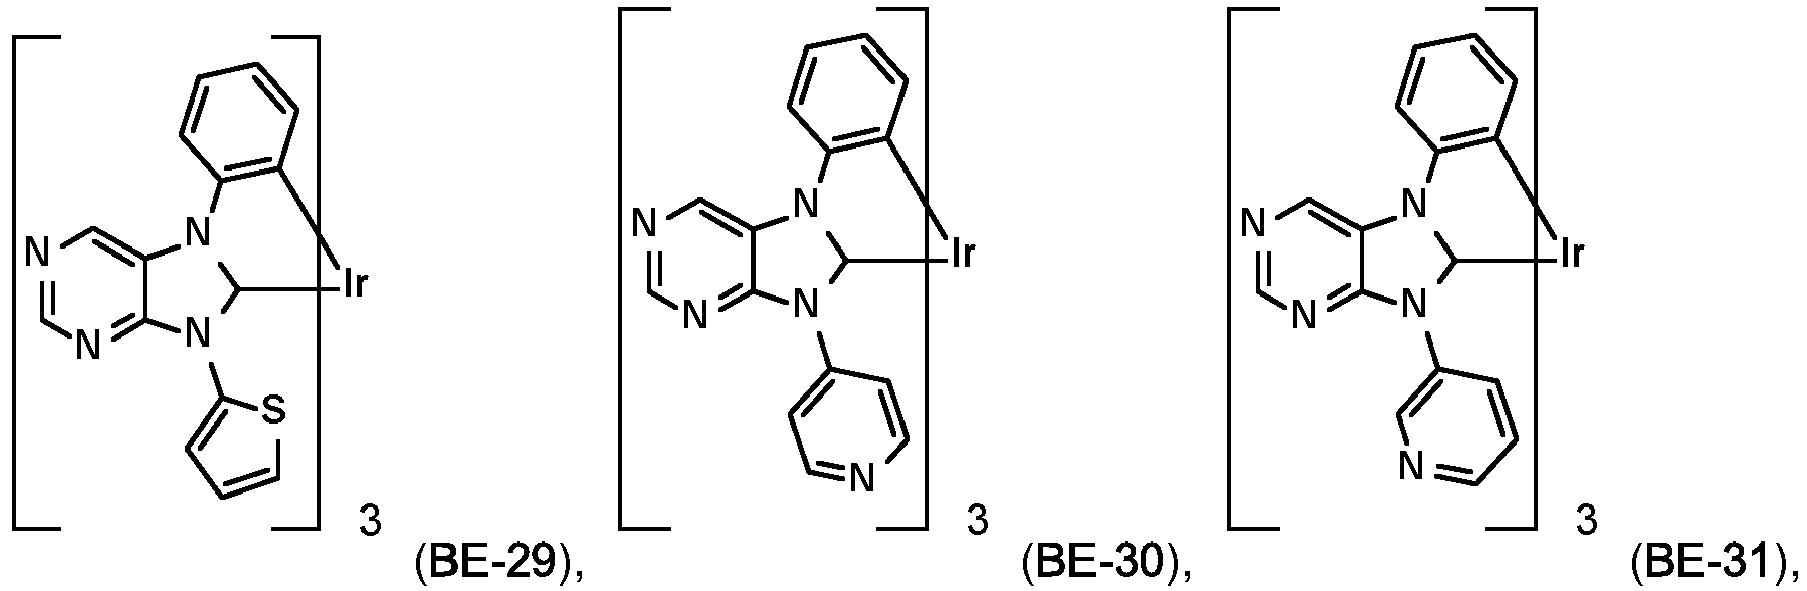 Figure imgb0762